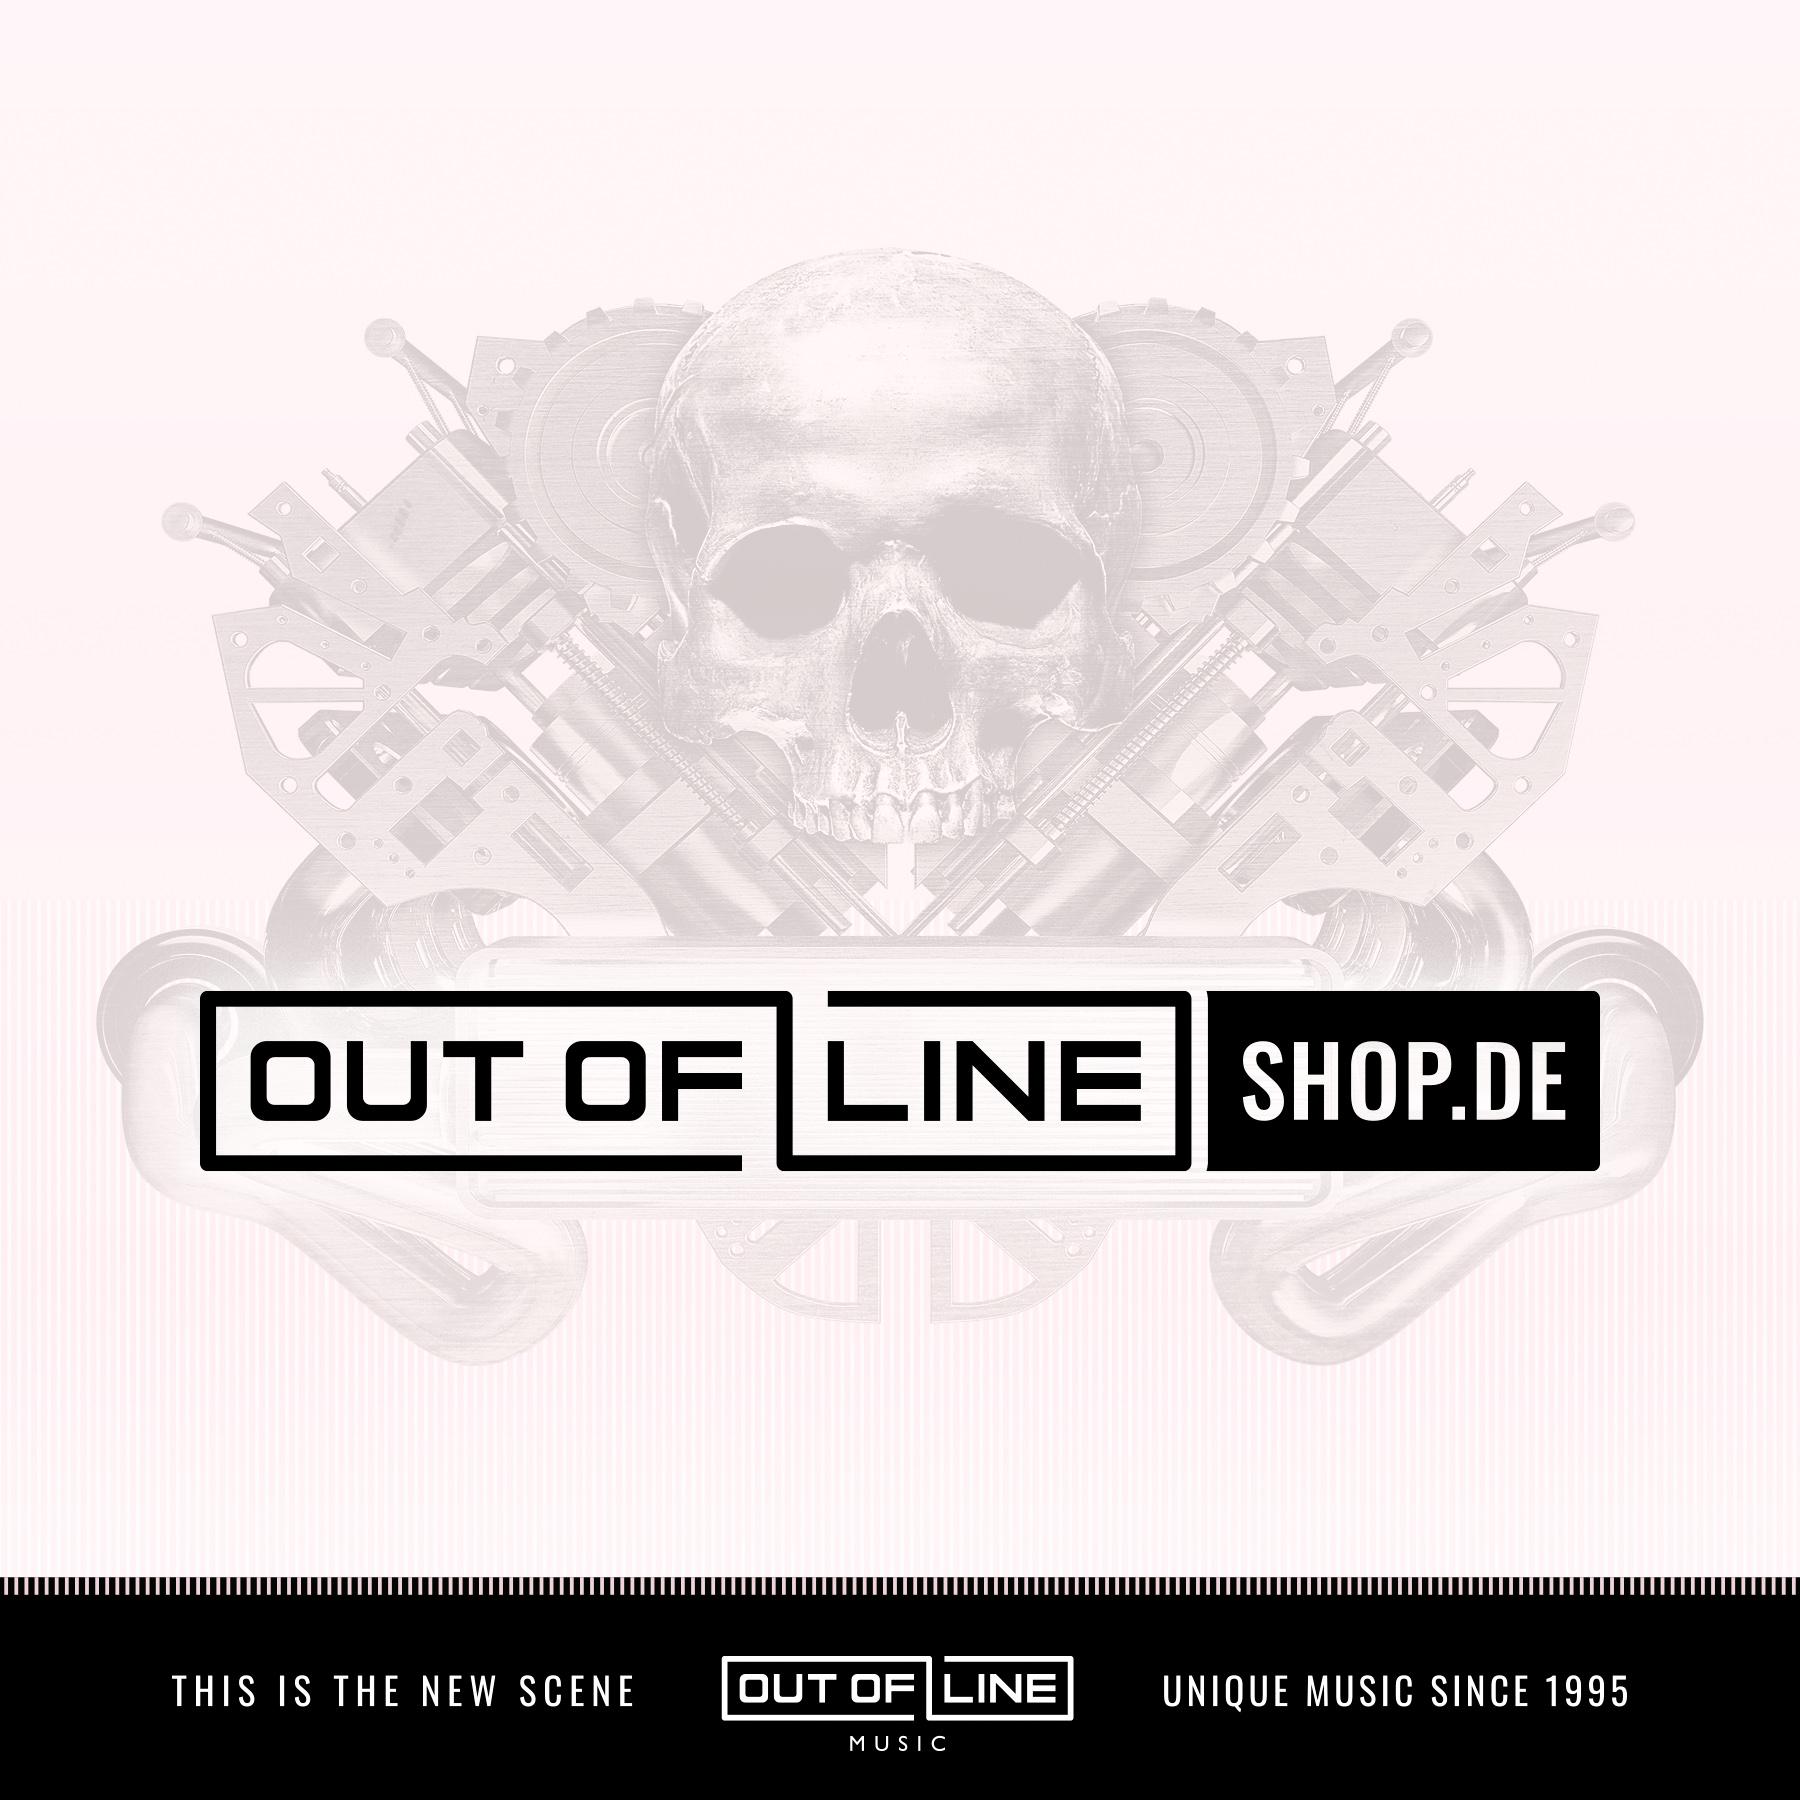 God Module - Does this Stuff freak you out? (A Retrospective) - 2CD